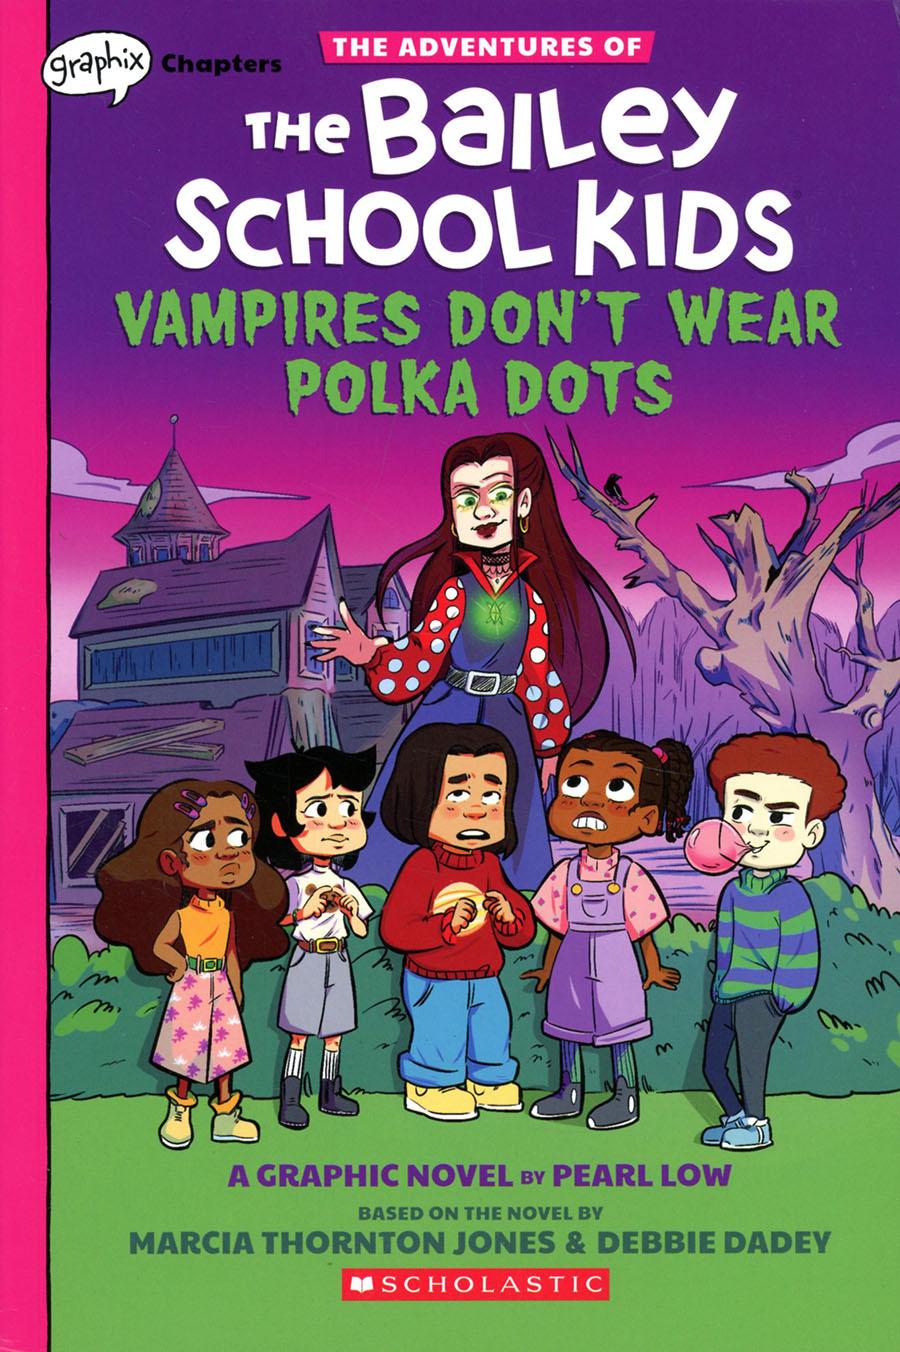 Adventures Of The Bailey School Kids Vol 1 Vampires Dont Wear Polka Dots TP